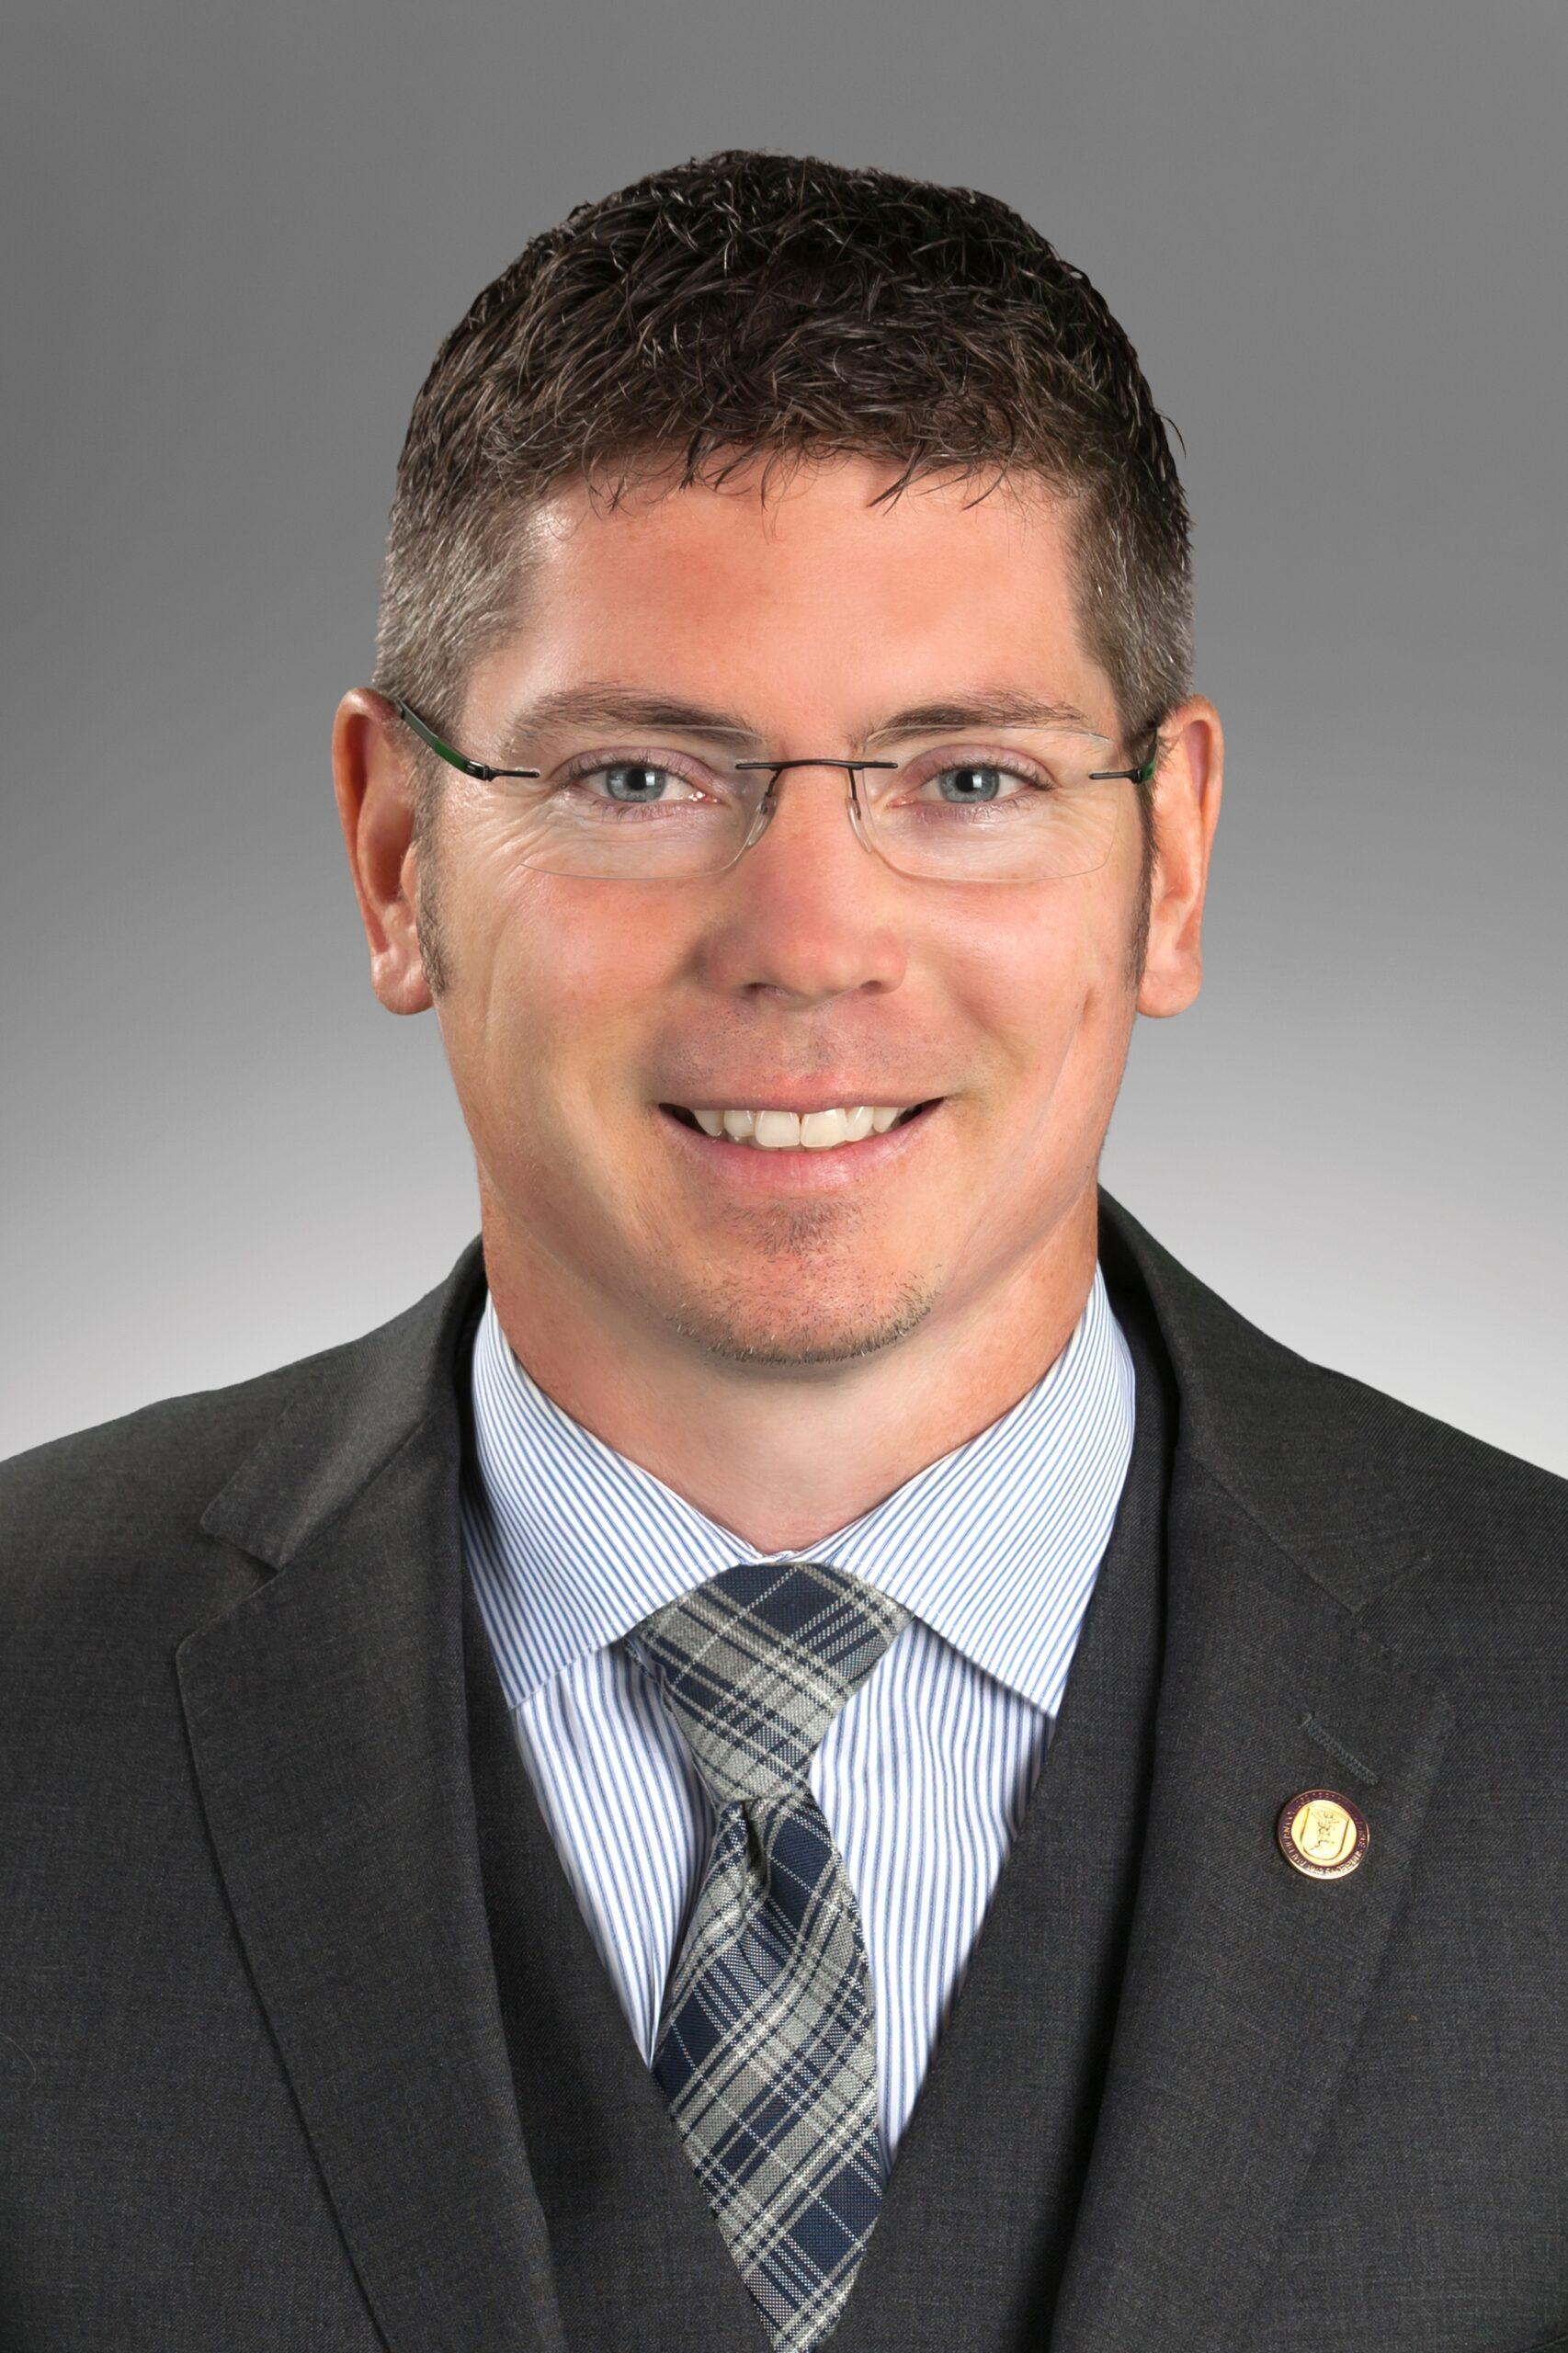 Dr. Jason Anderson